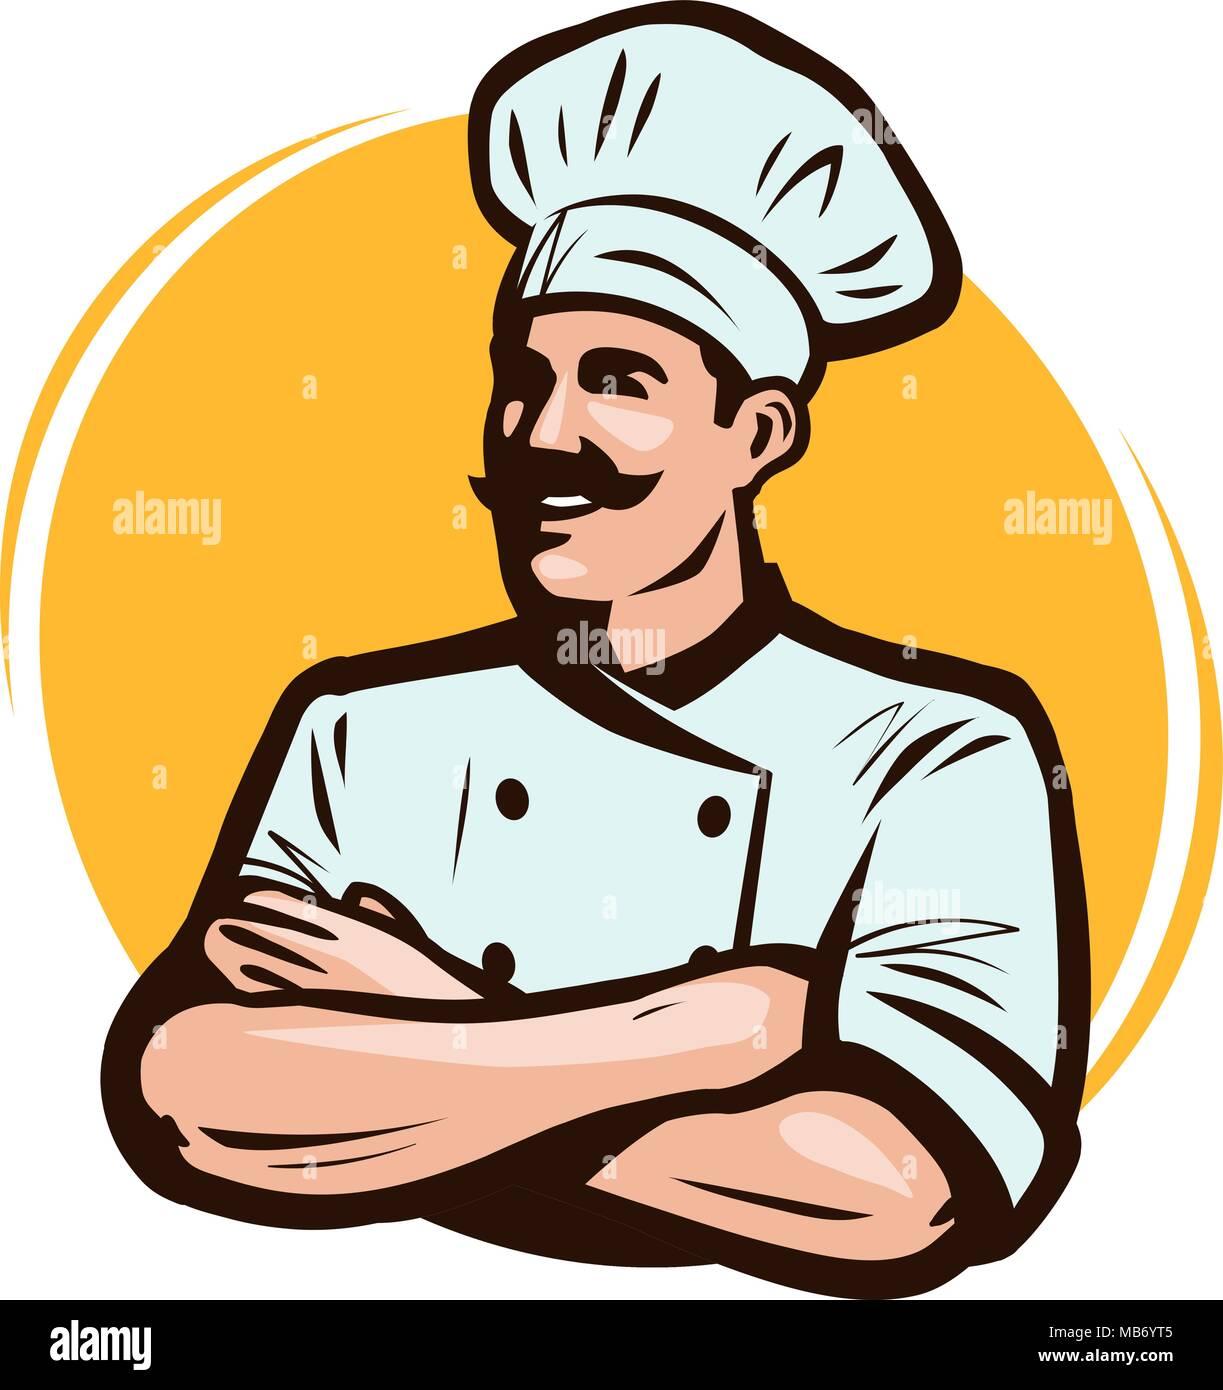 cook chef logo or label restaurant concept cartoon vector